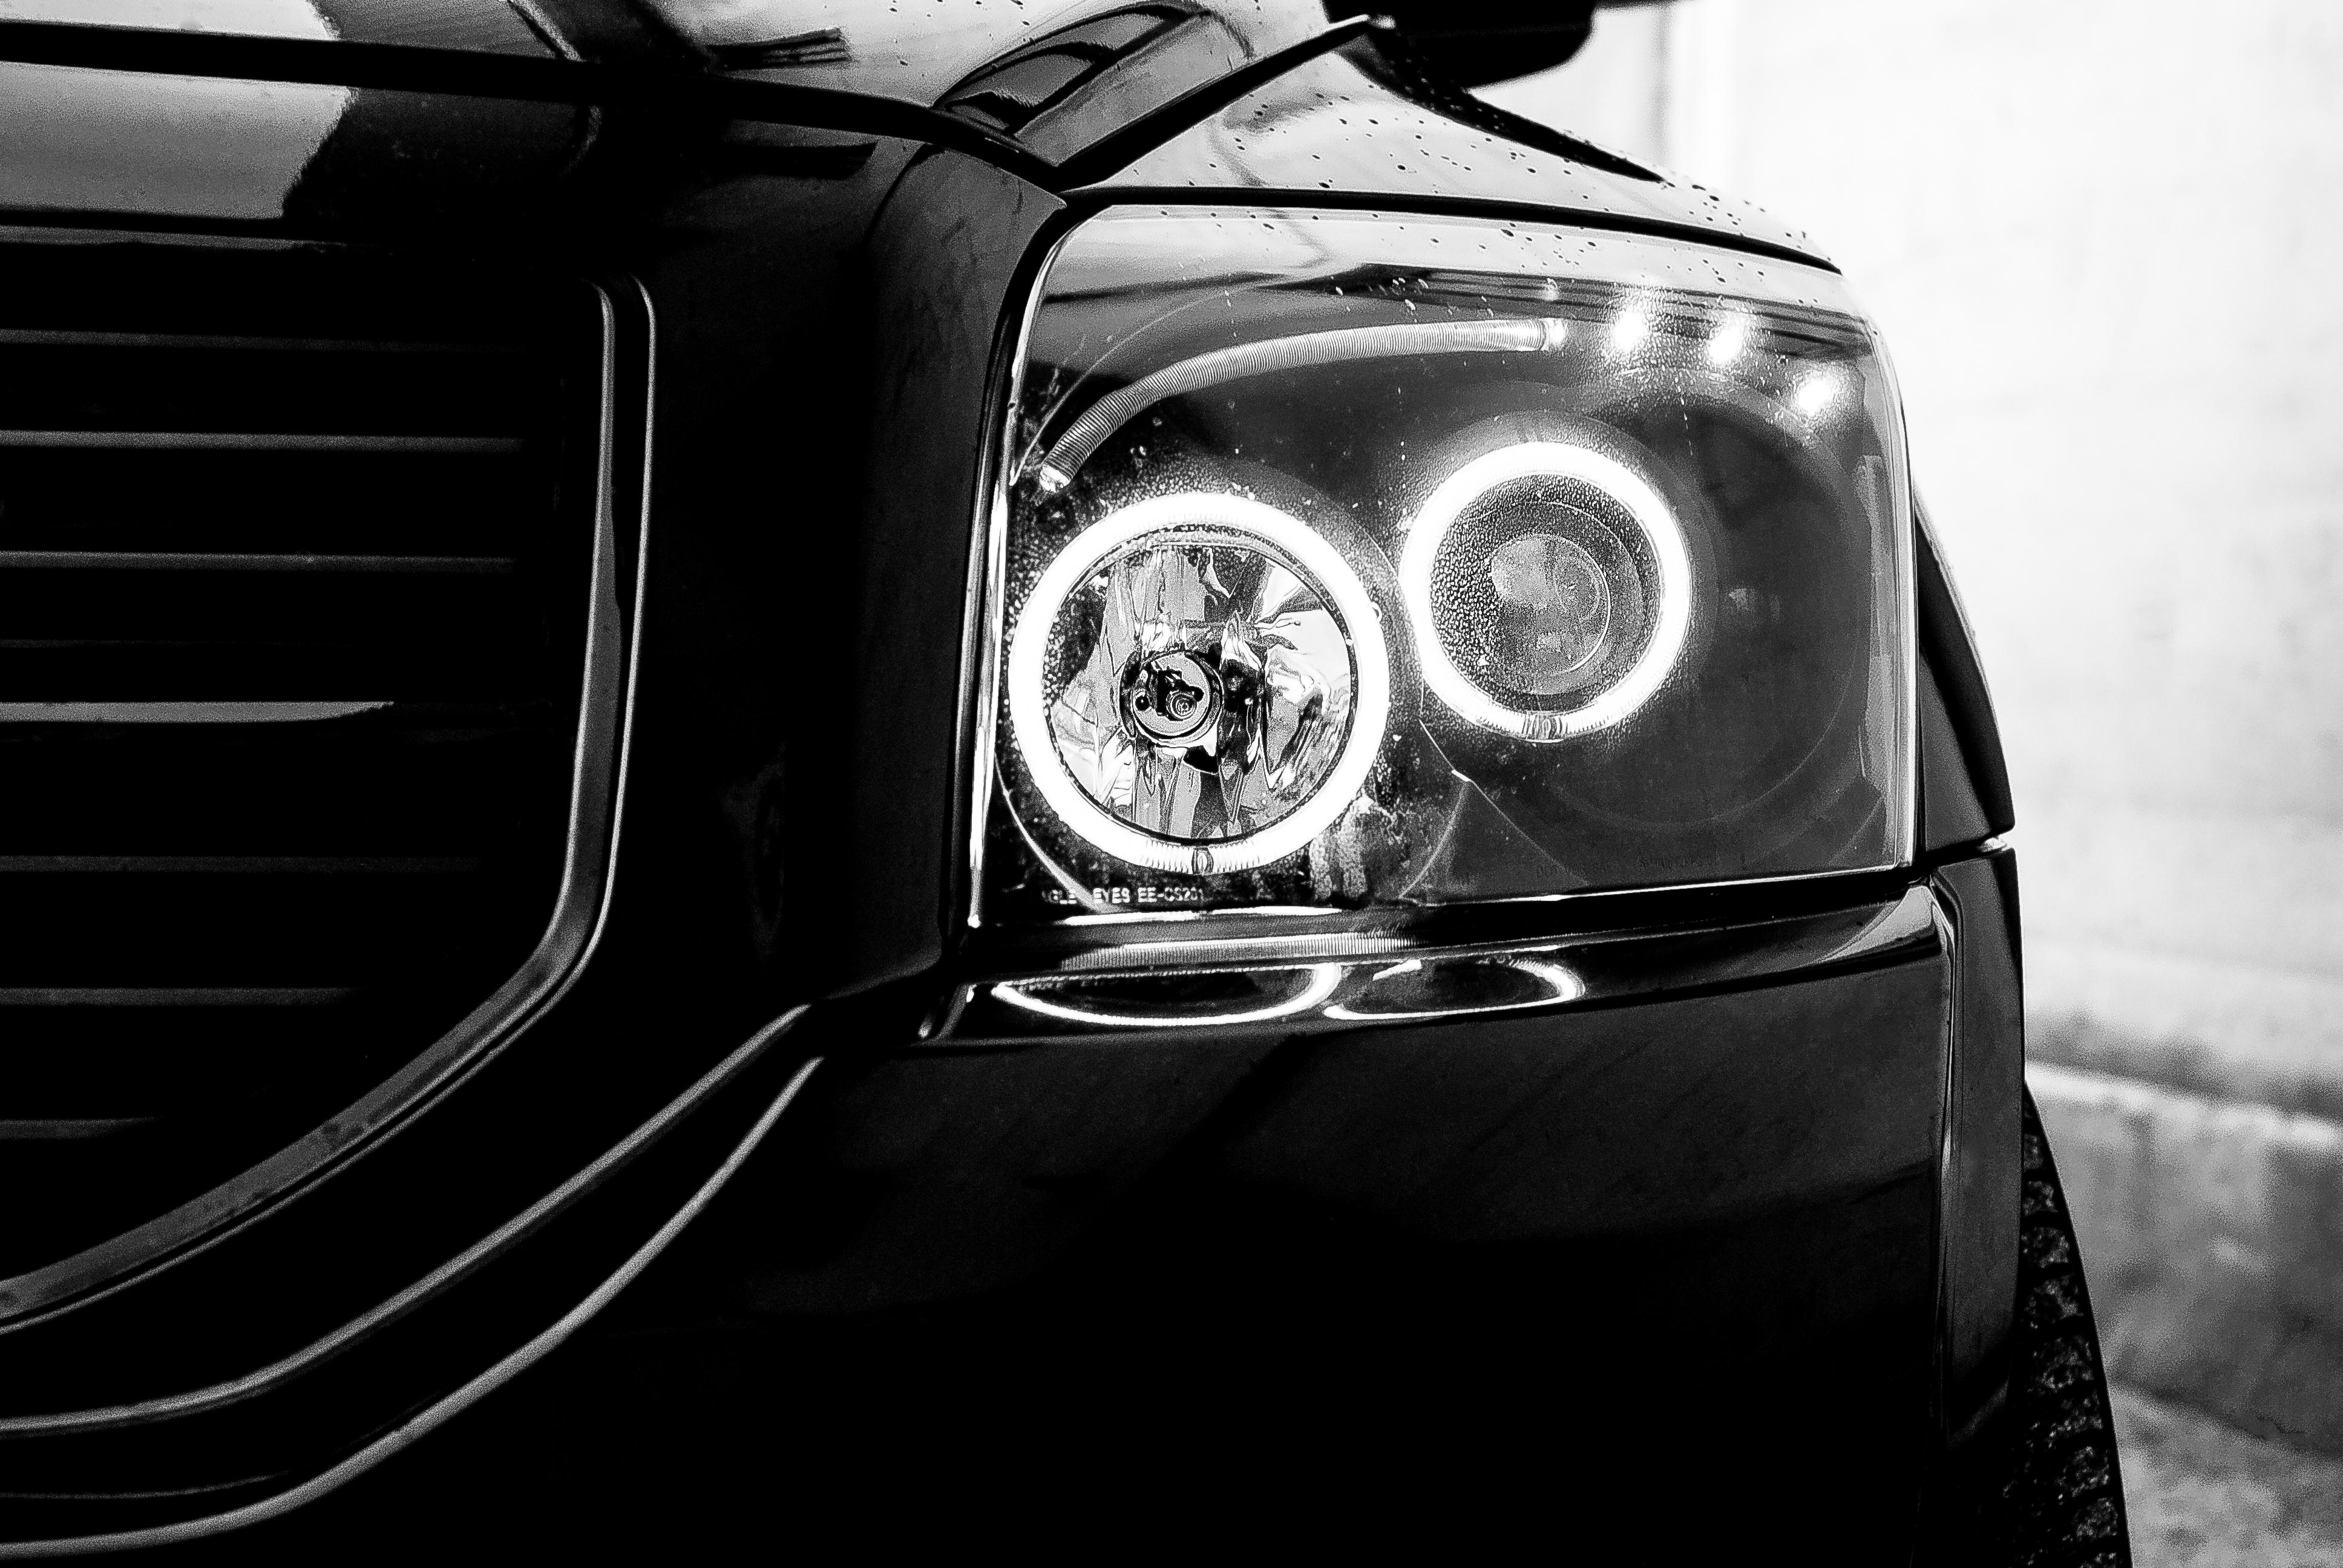 Evil eyes, Automobile, Black, Car, Headlights, HQ Photo